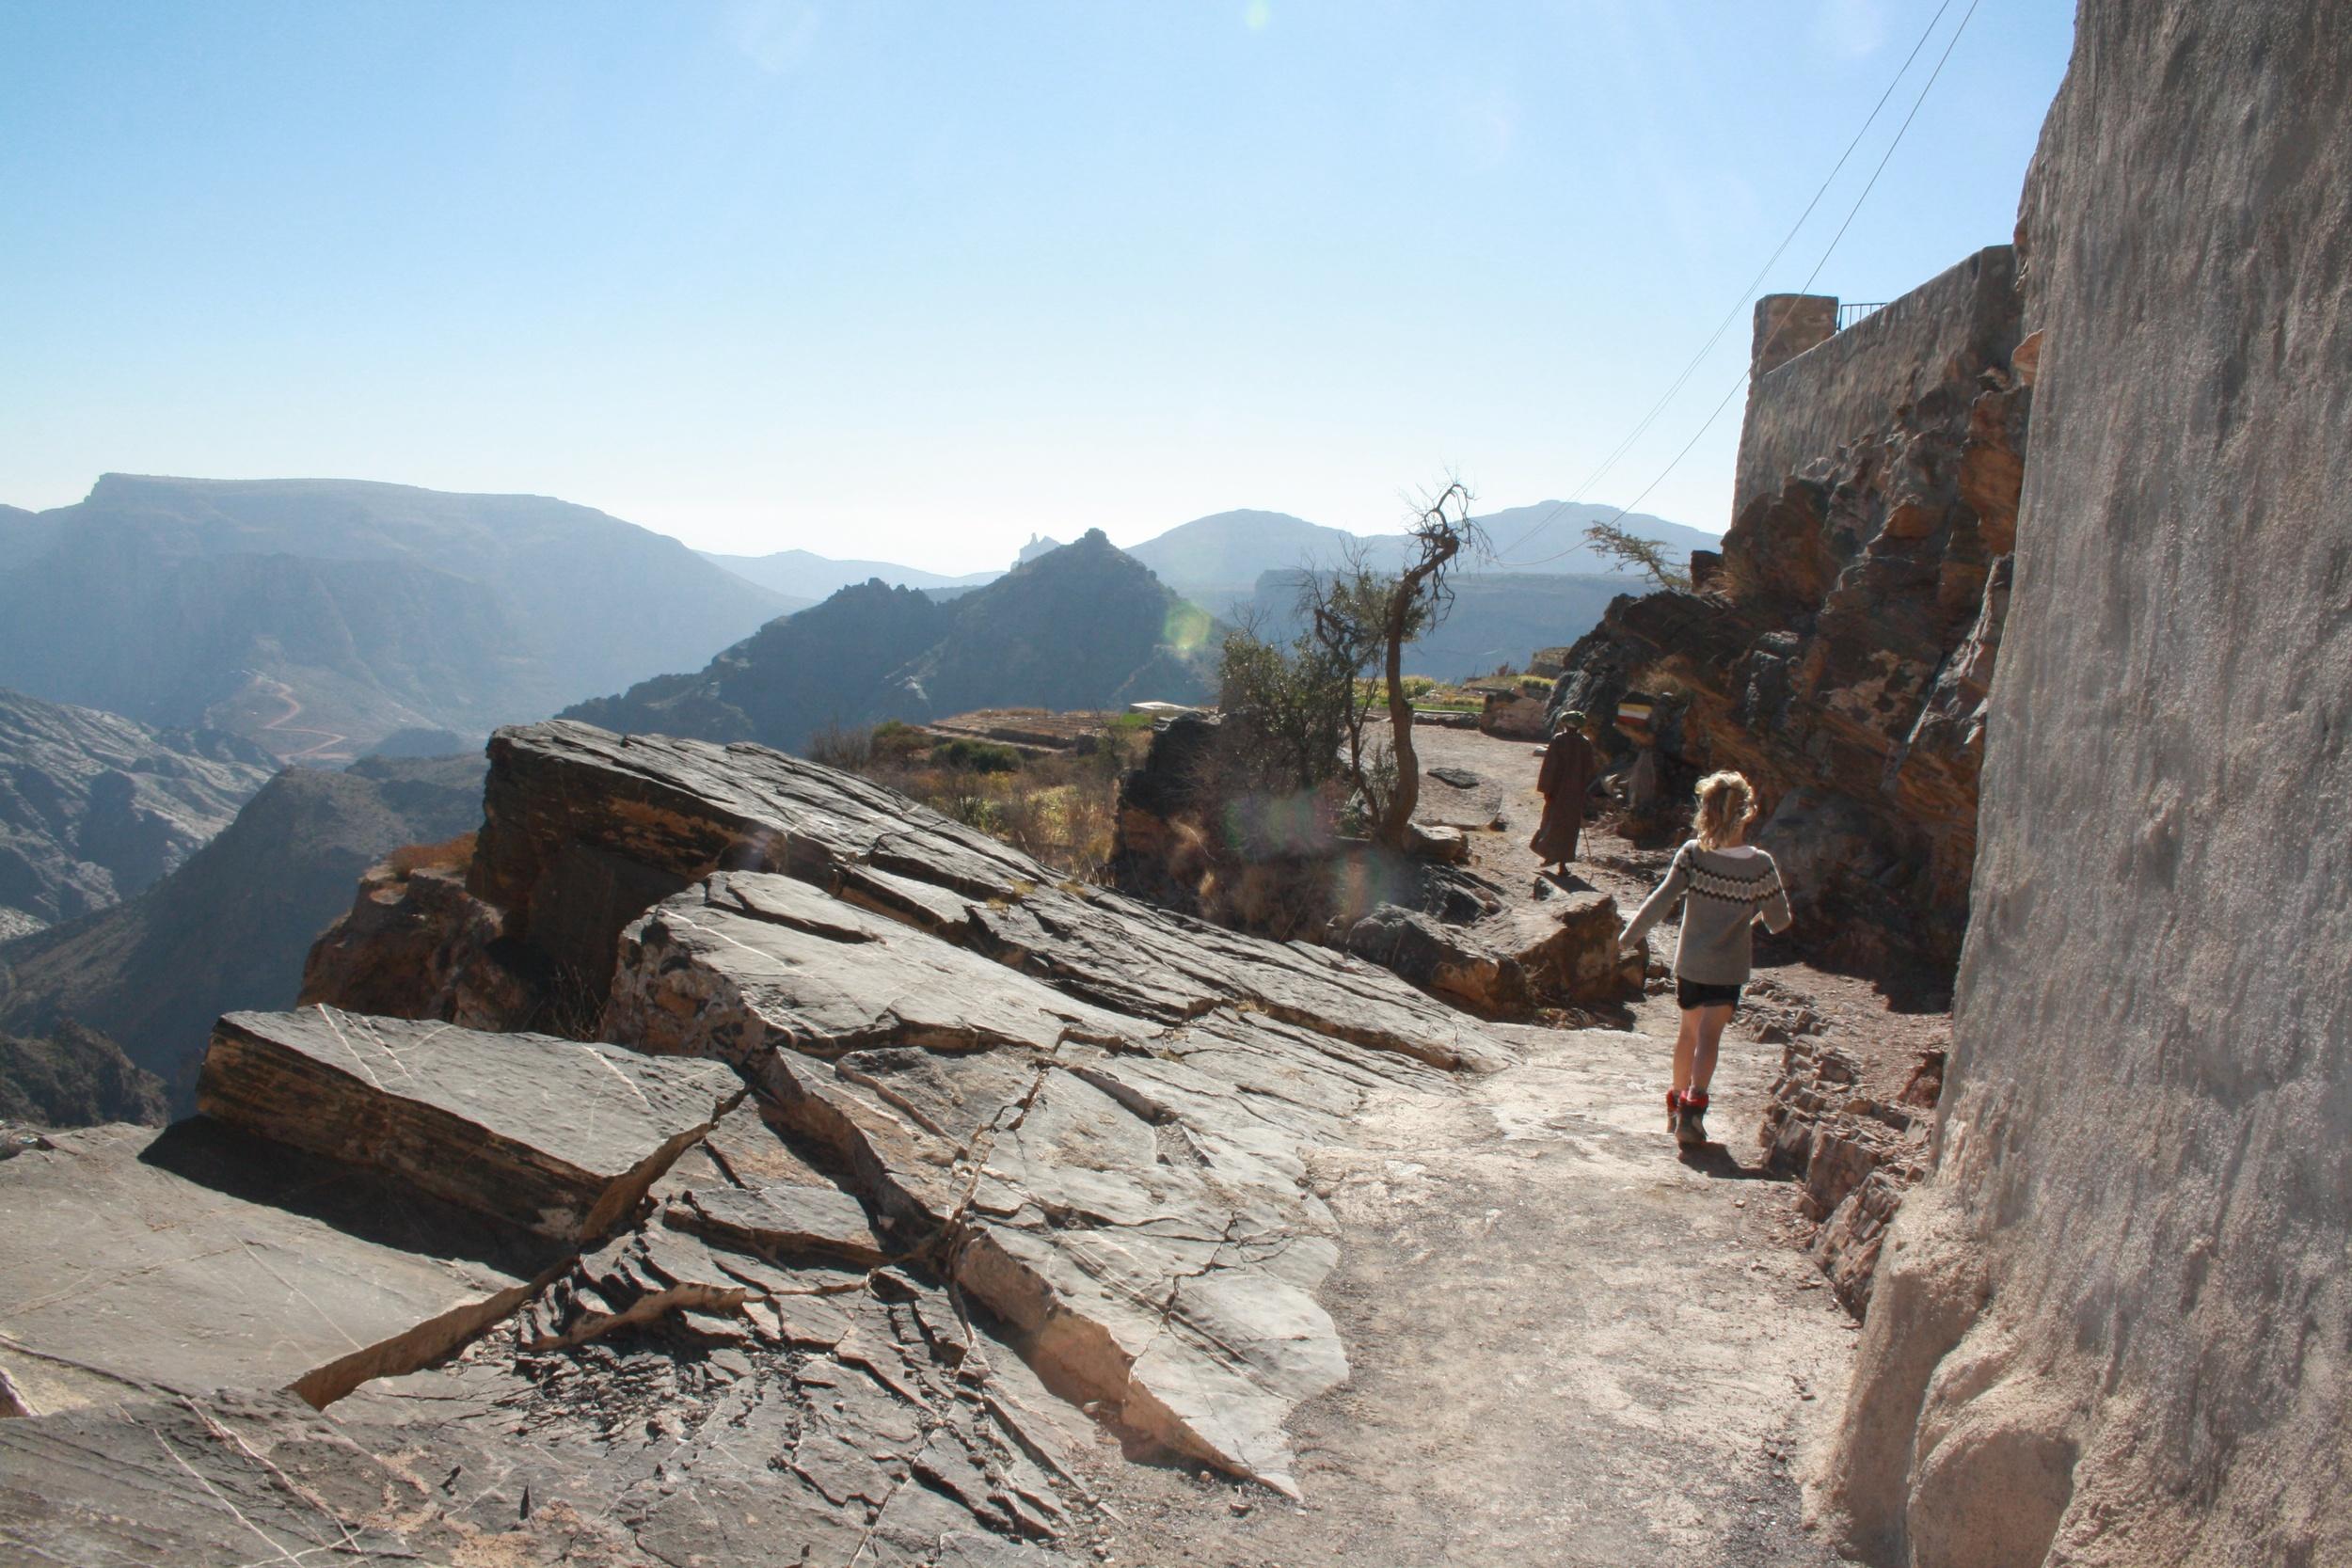 Ung og gammel på tur i fjellområdet Jebel Akhdar. Foto: Kjersti S. Macdonald Aursnes